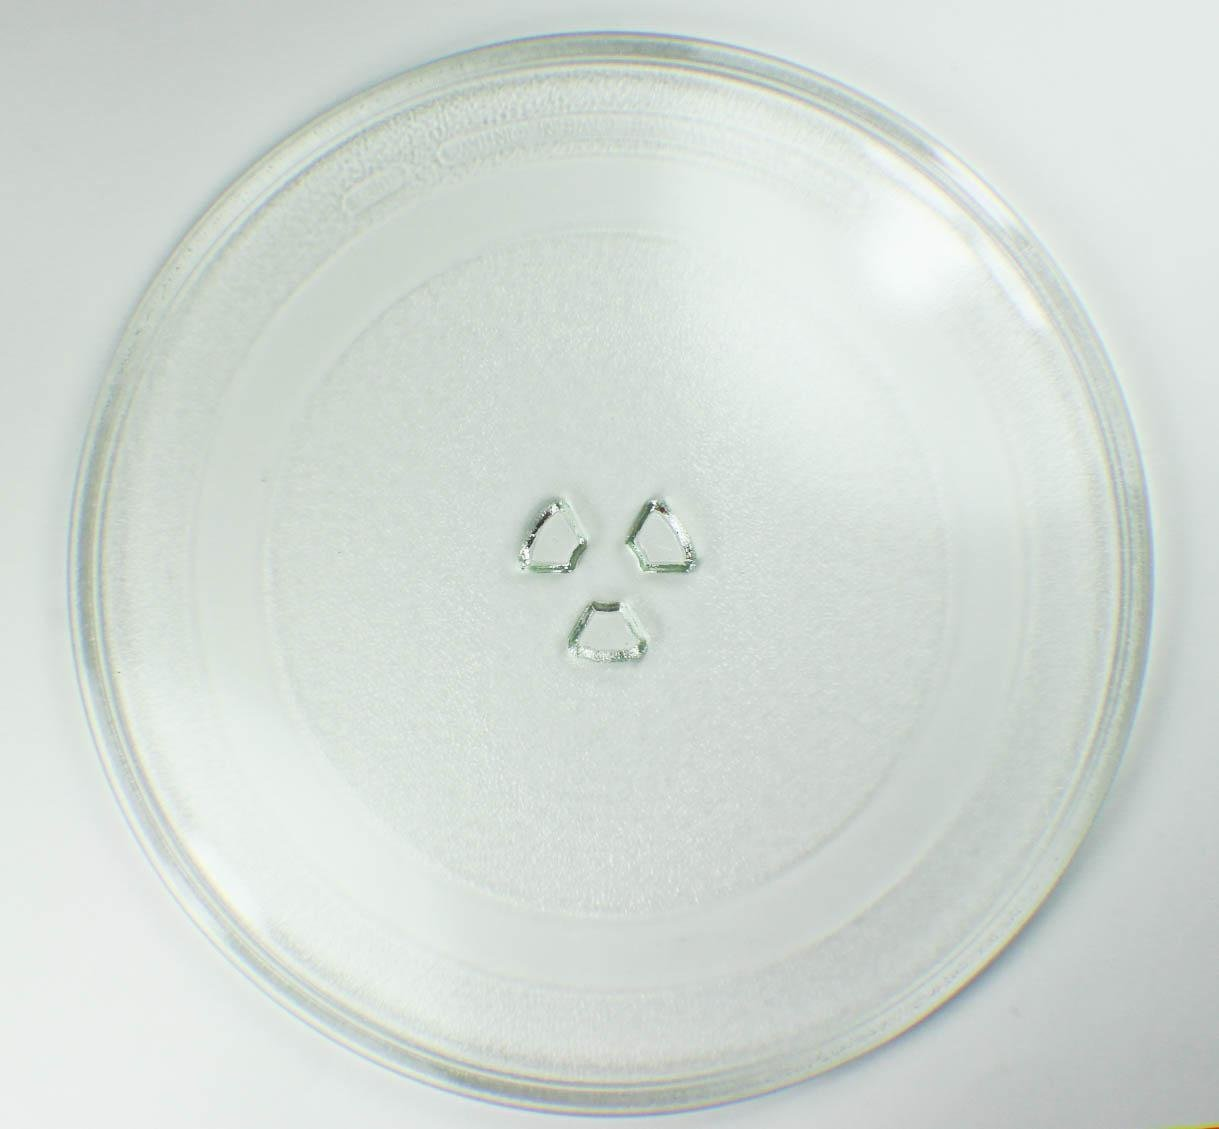 Whirlpool W10337247 Microwave Glass Tray